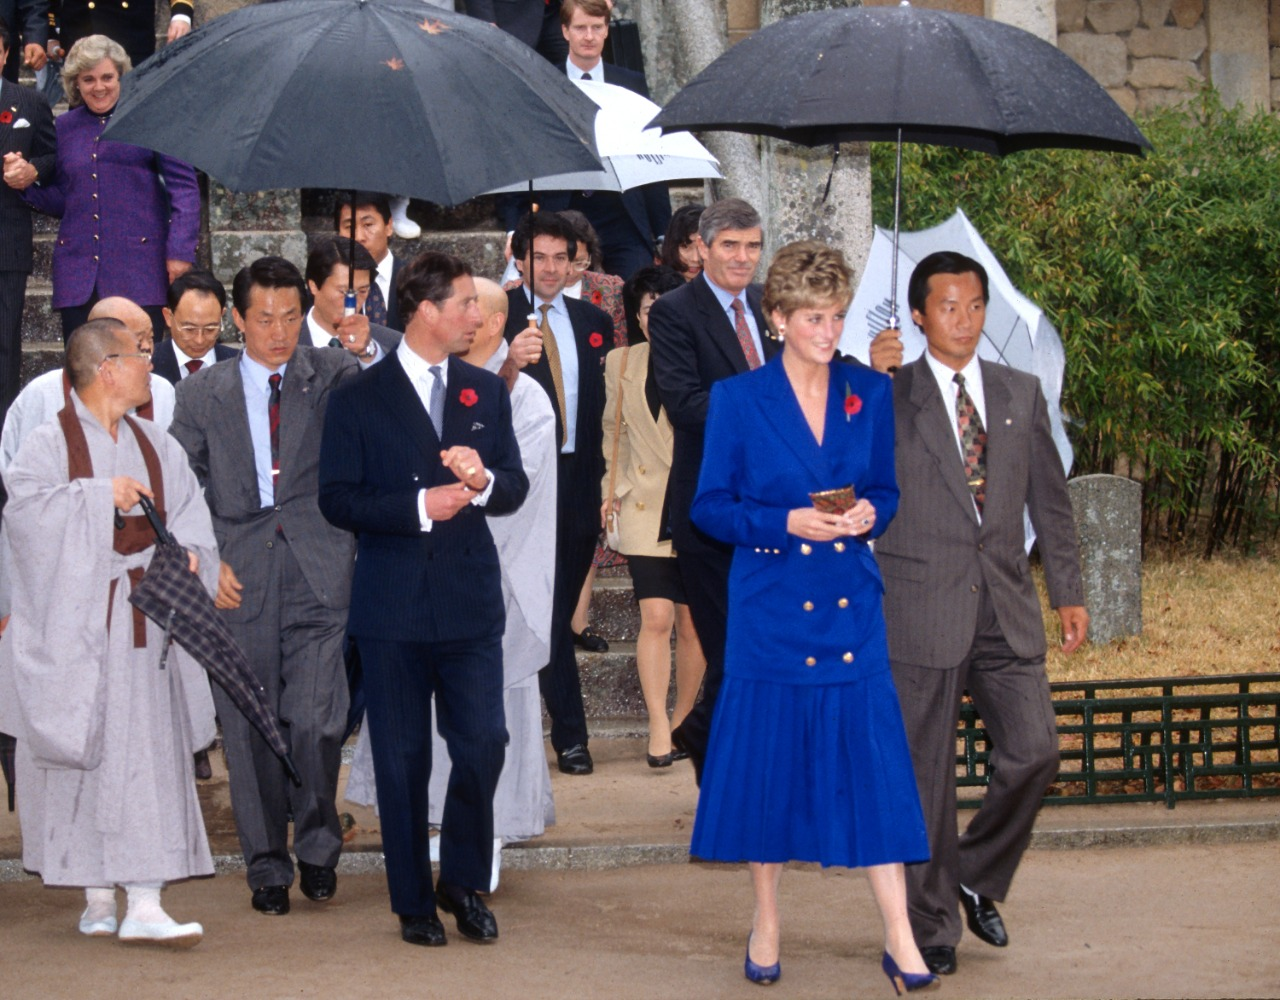 Kate Middleton imitó el icónico outfit azul de Lady Di en su tour por Escocia